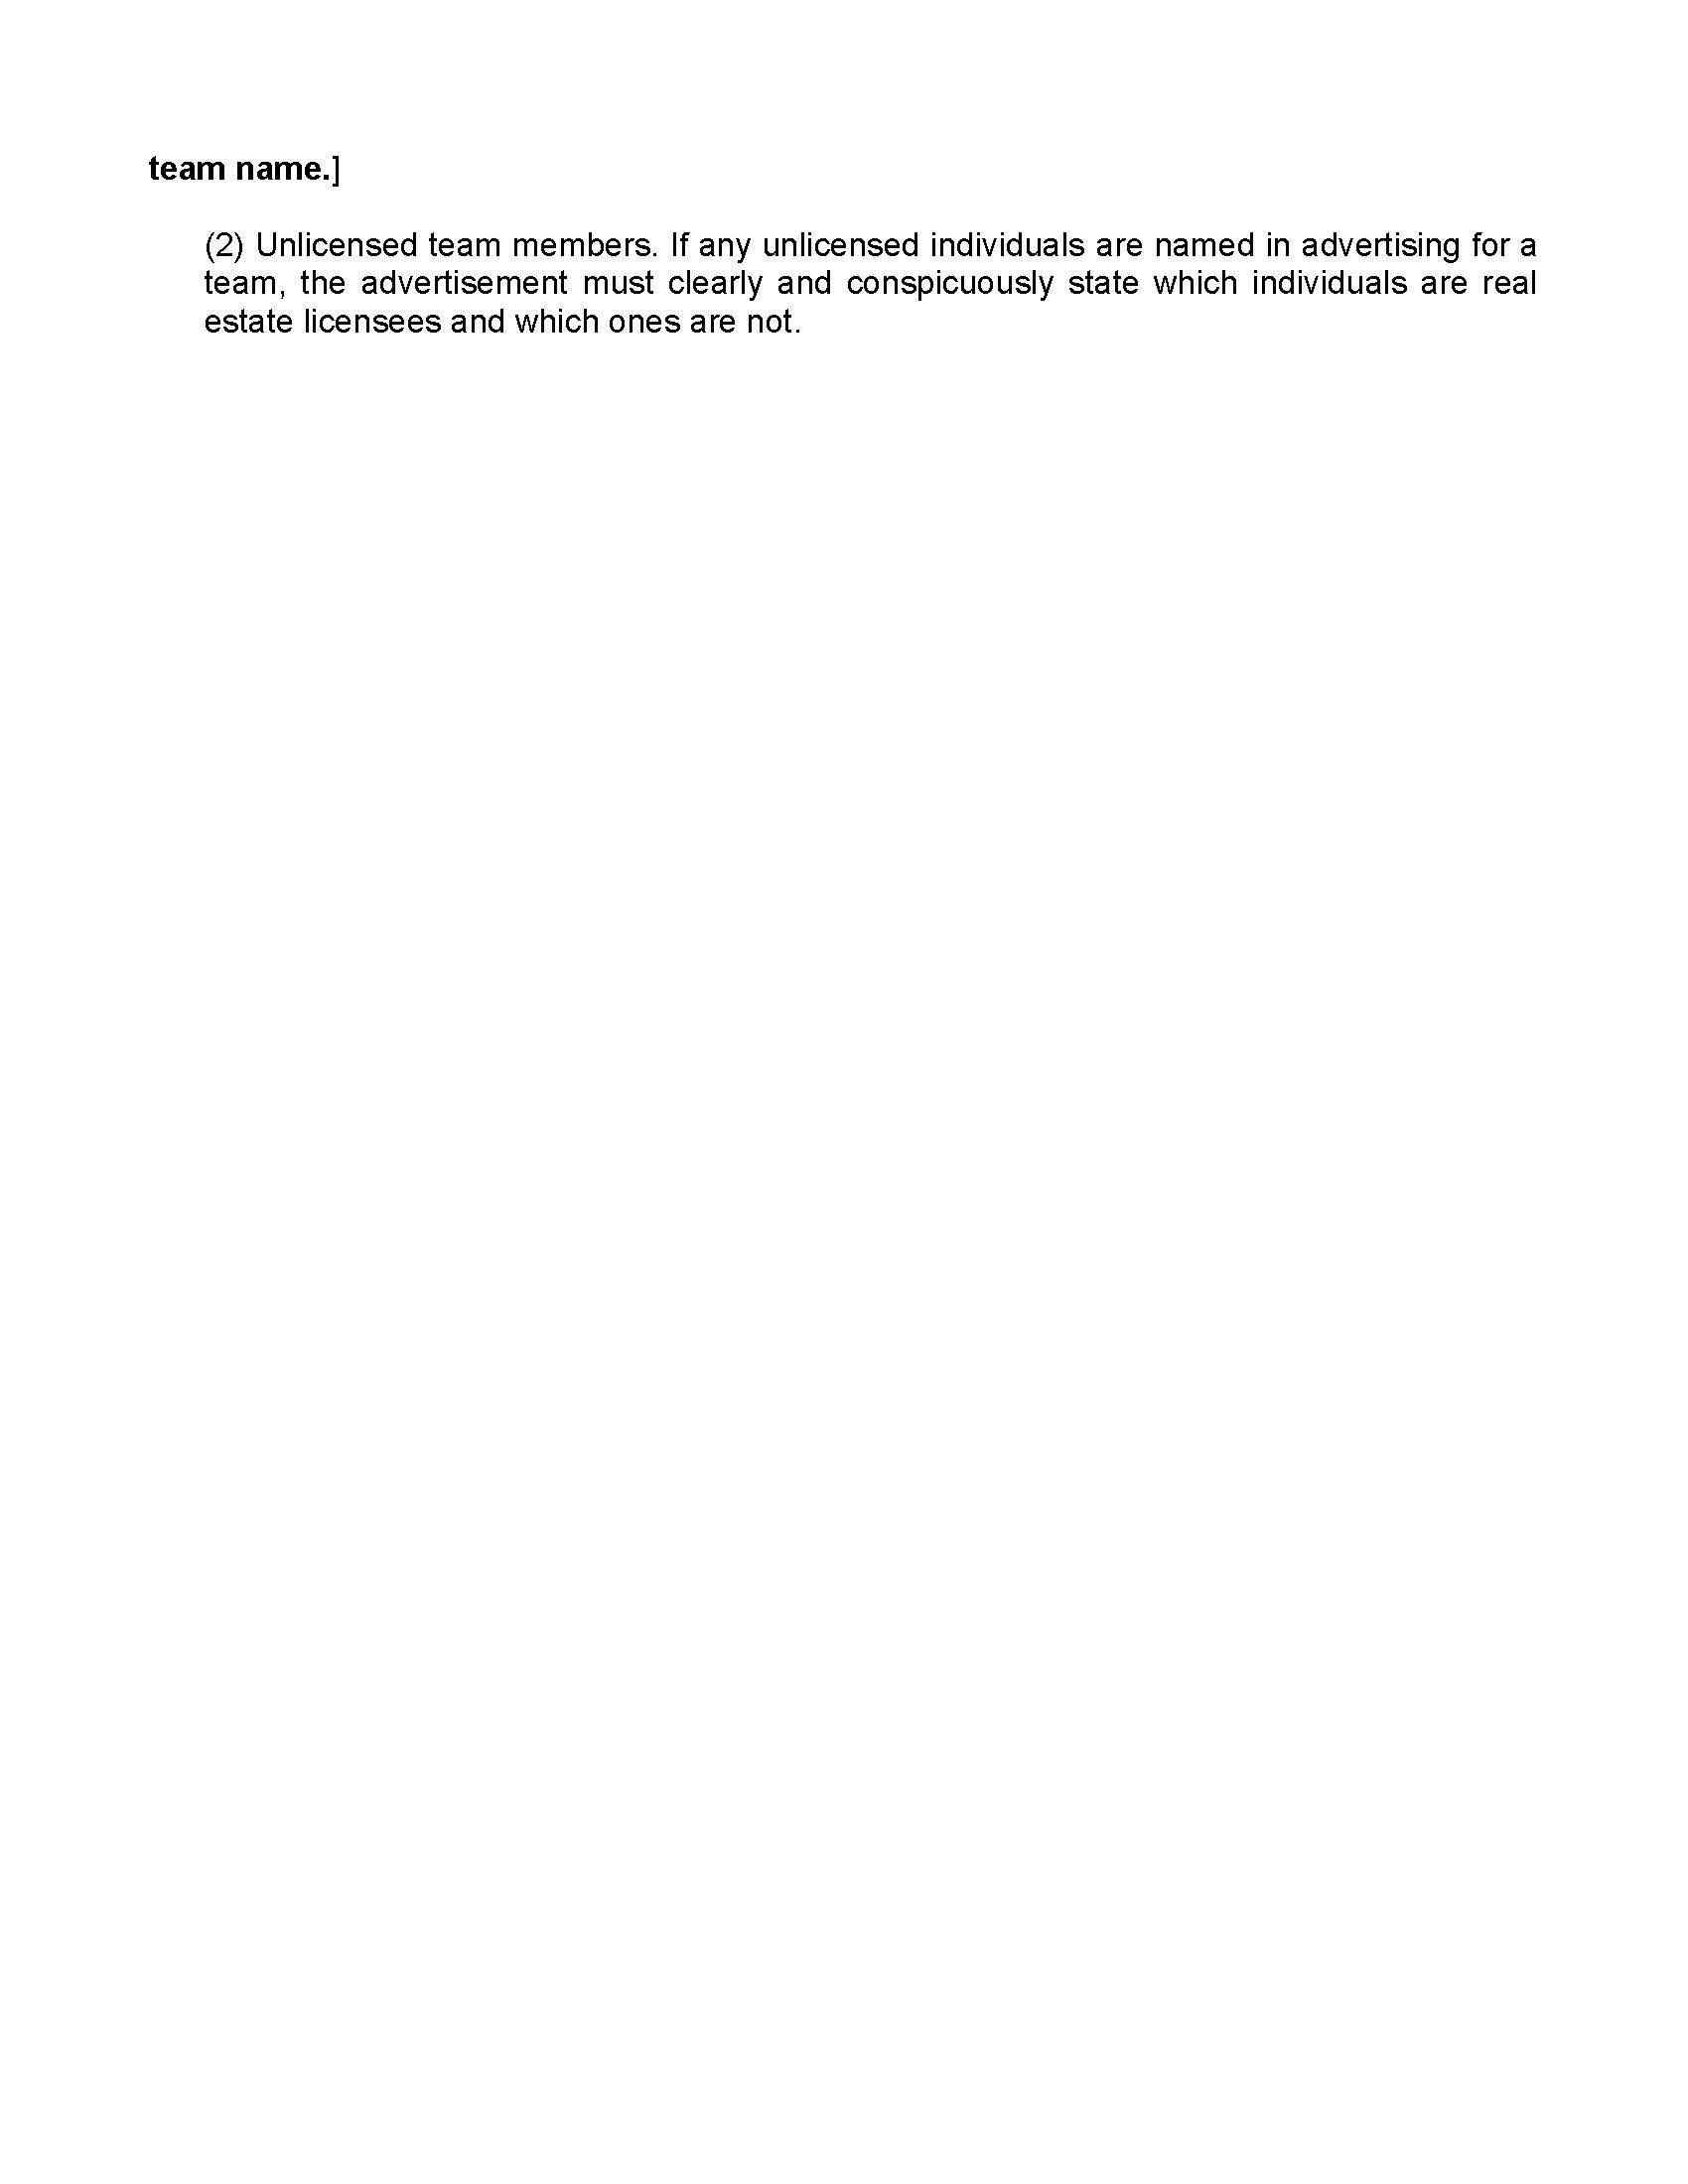 https://0201.nccdn.net/1_2/000/000/0c7/6c5/leg_2020_nys_advertising_regulation_110220_page_5.jpg